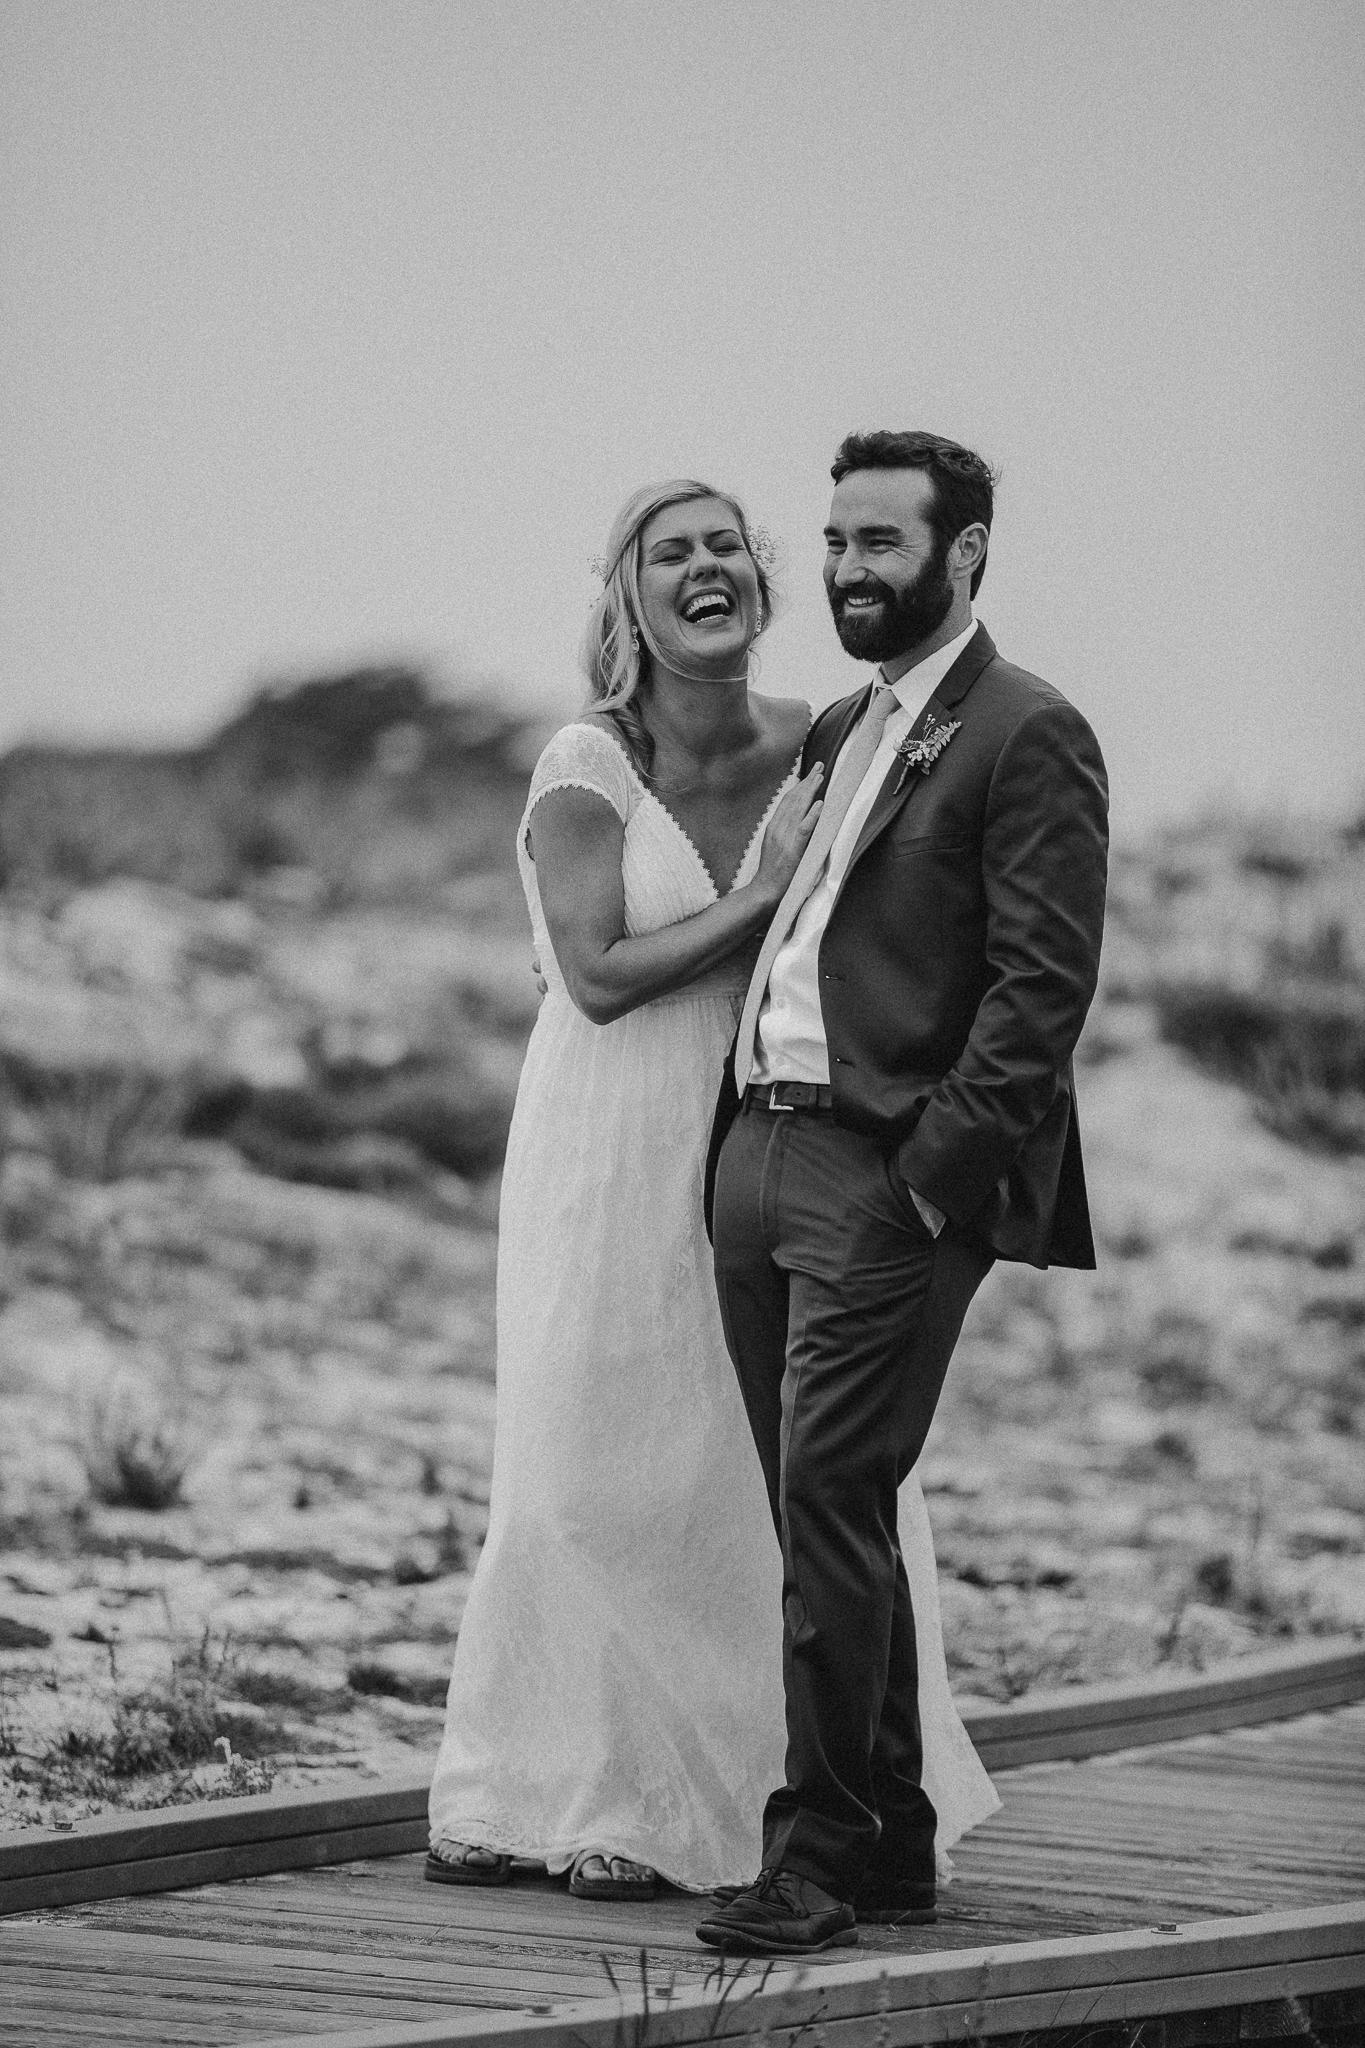 Archer_Inspired_Photography_Pacific_Grove_Ansilomar_Beach_Carmel_Valley_Wedding-54.jpg